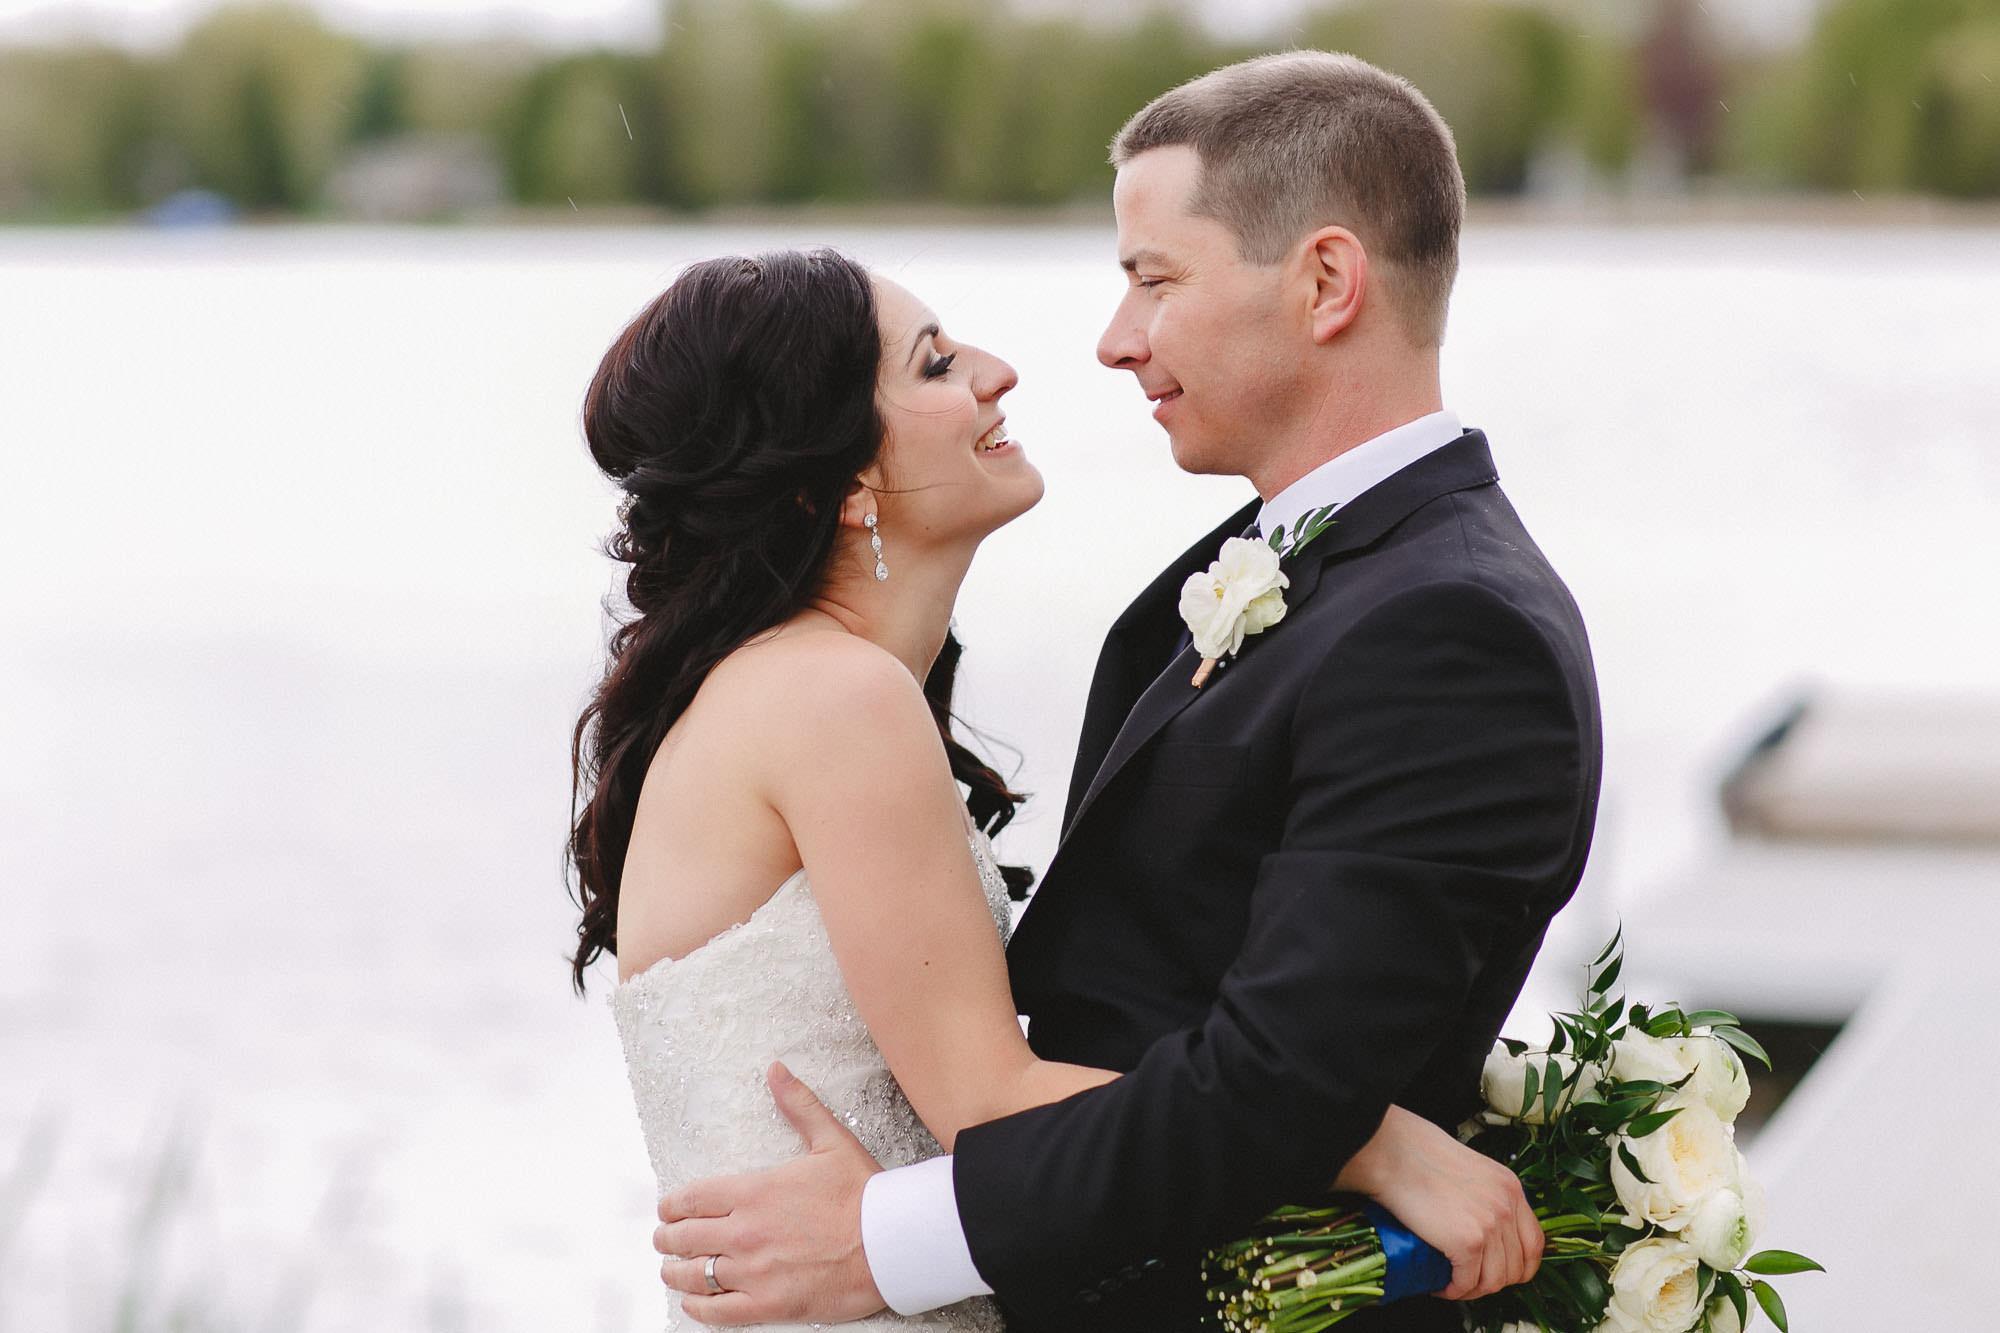 michigan-backyard-wedding051430.jpg